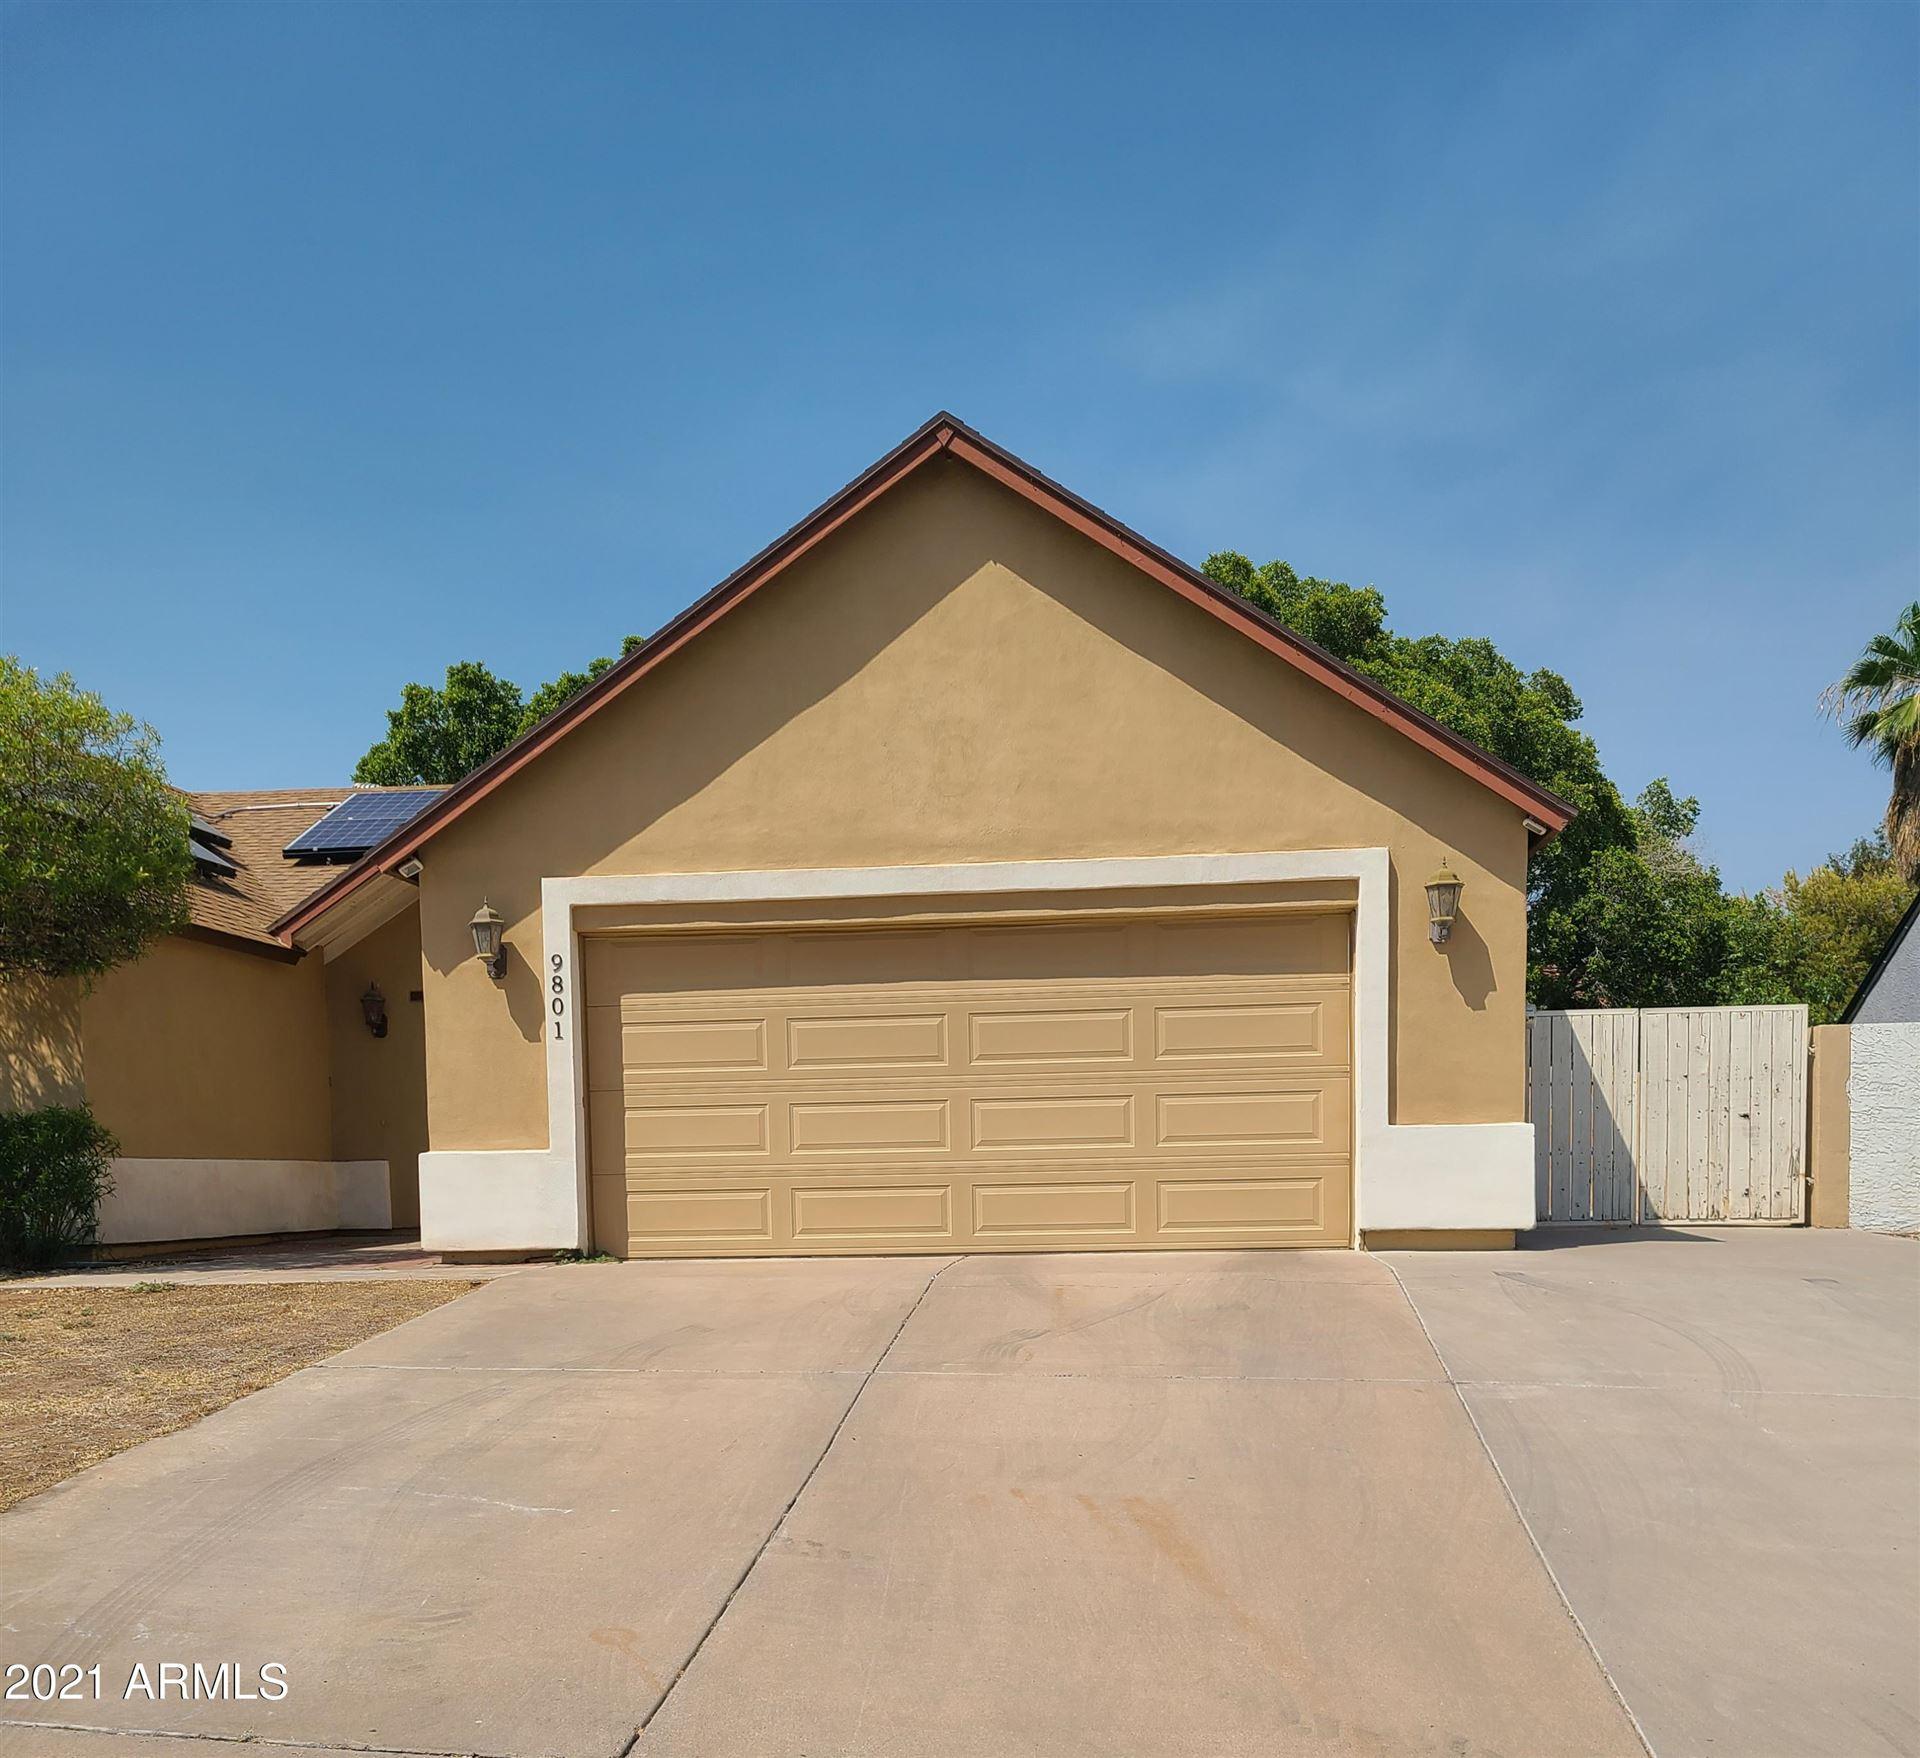 9801 S 47TH Place, Phoenix, AZ 85044 - MLS#: 6250298